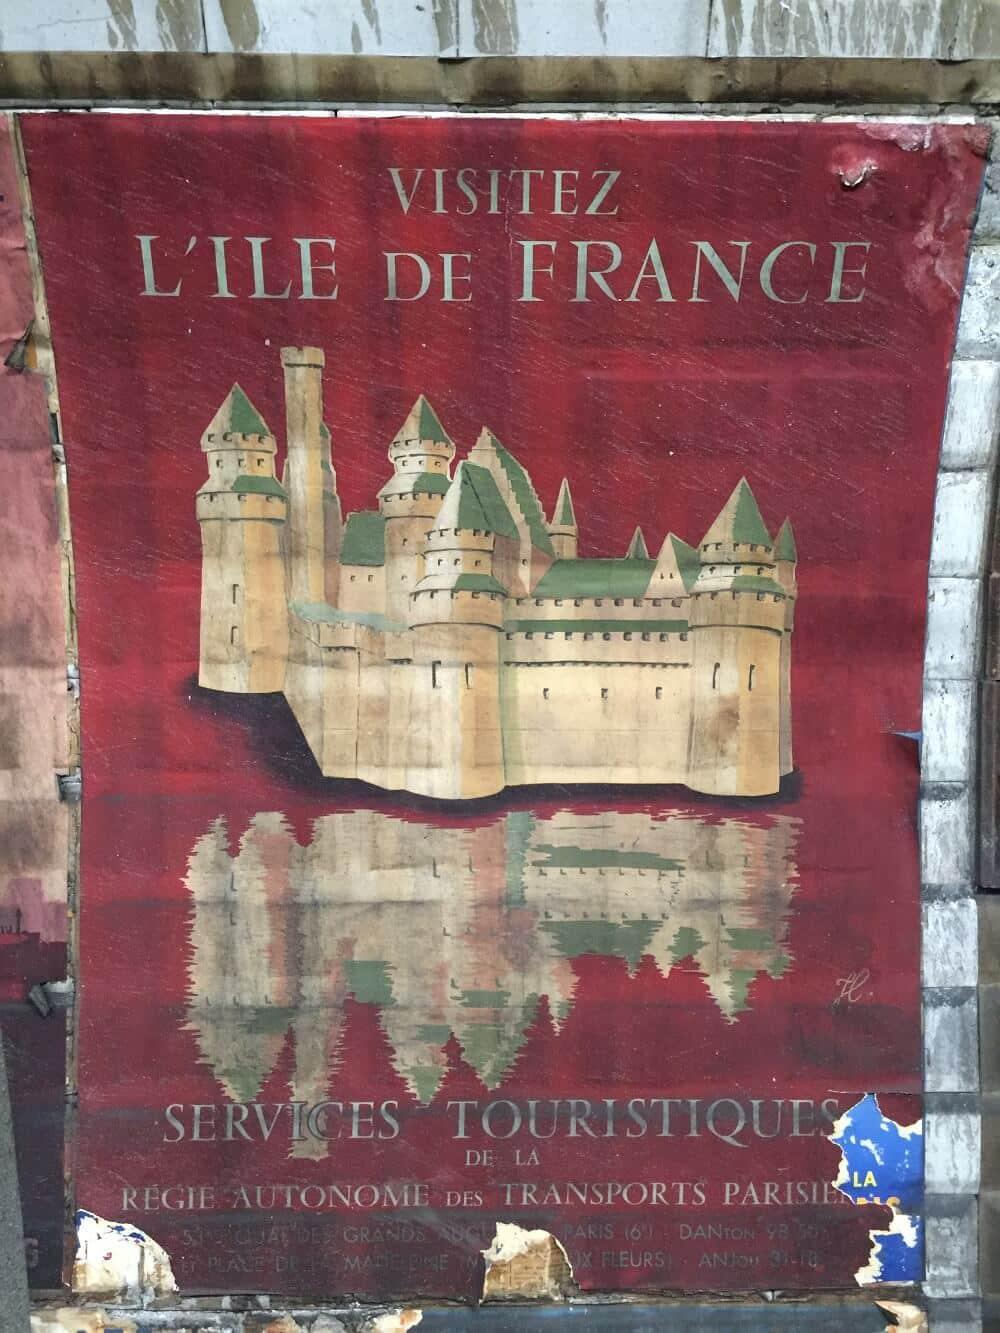 Paris, metro, renovation, temps